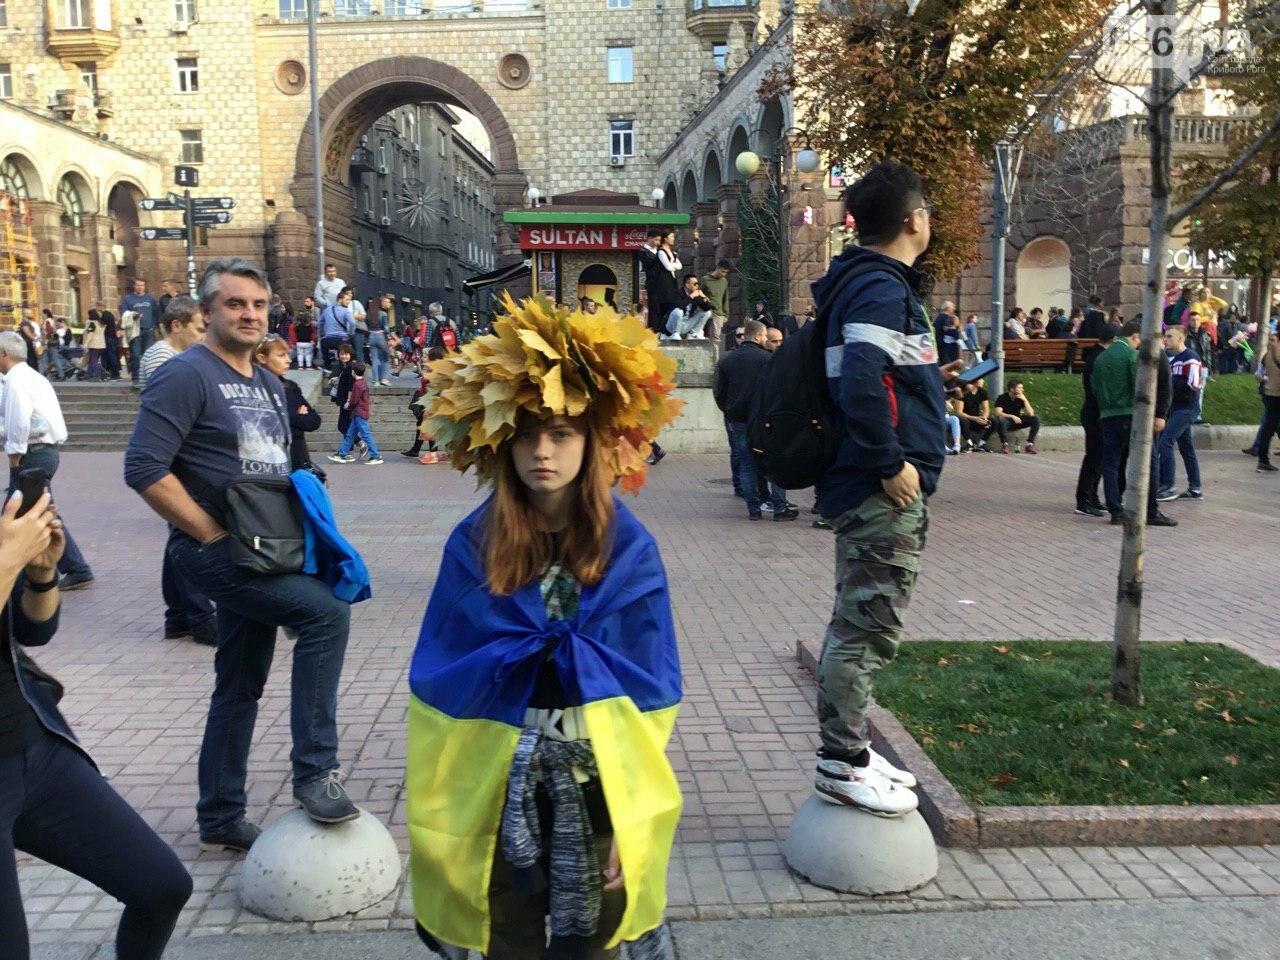 Криворожане поддержали Марш сопротивления капитуляции в Киеве, - ФОТО, ВИДЕО, ОБНОВЛЕНО, фото-23